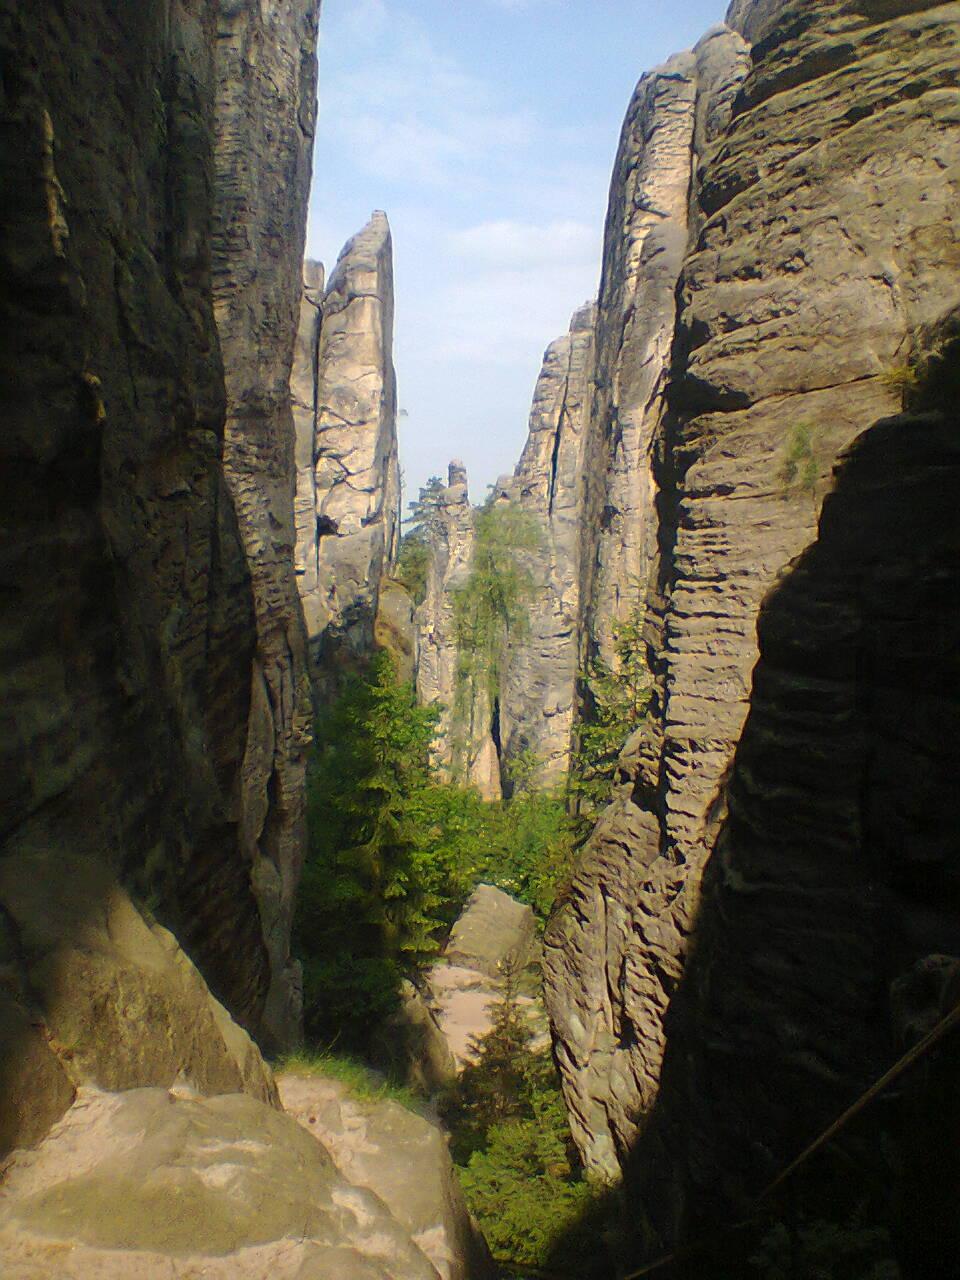 https://www.kempy-chaty.cz/sites/default/files/turistika/prachovske_skaly_v_cele_sve_krase.jpg